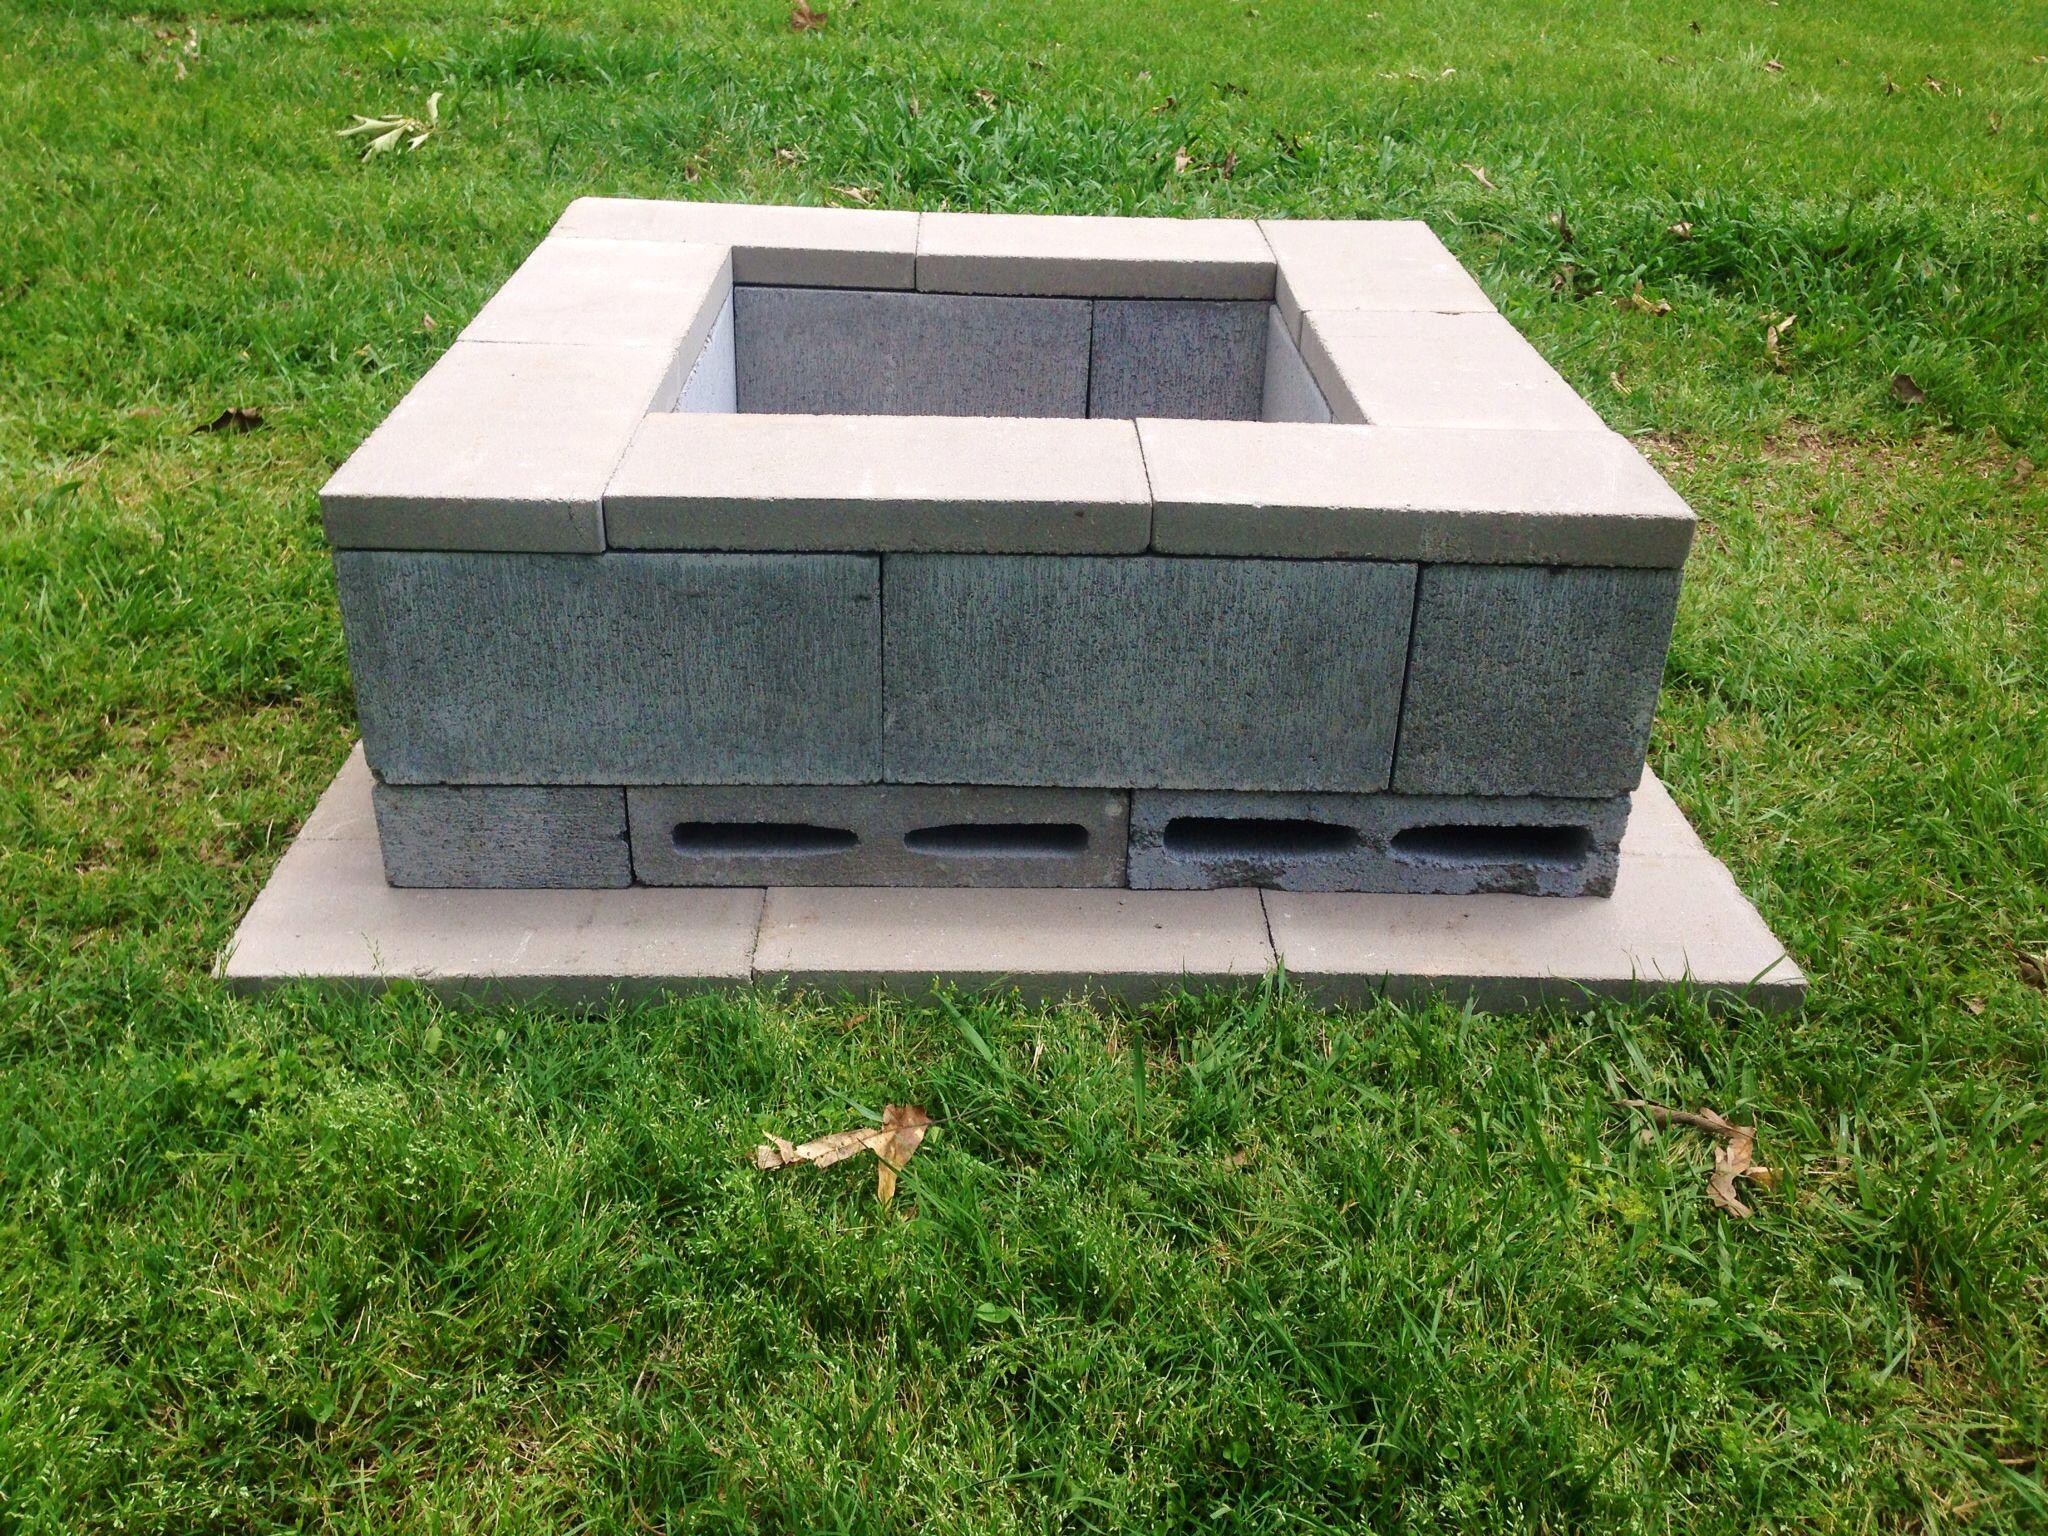 DIY Fire Pit, We used 26 - 18x6x2 Flats, 8 - Cinder Blocks ... on Cinder Block Fireplace Diy id=13815